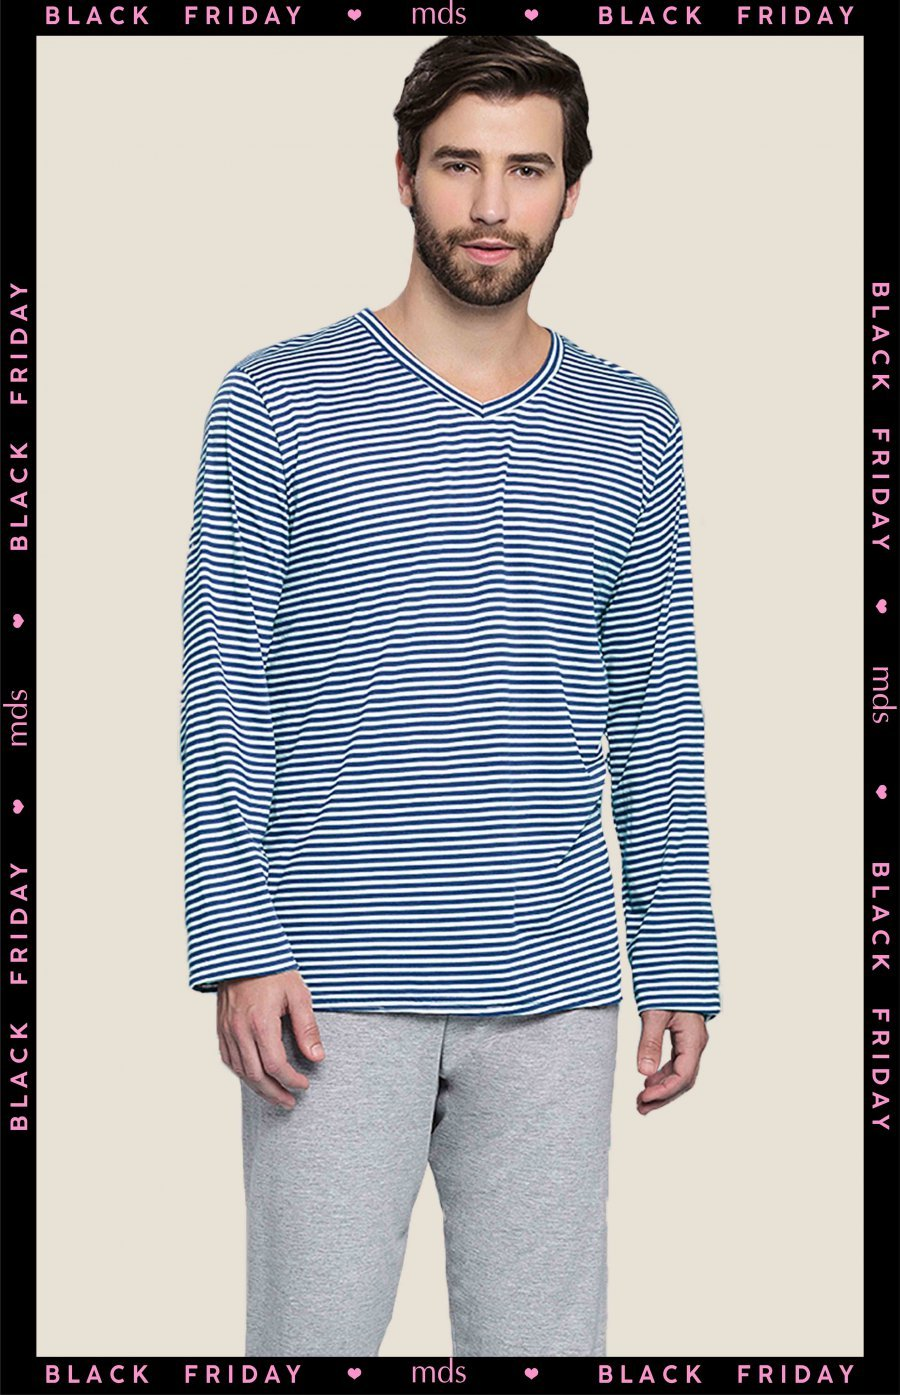 BLACK FRIDAY Pijama Plus Size Holiday Inverno MDS